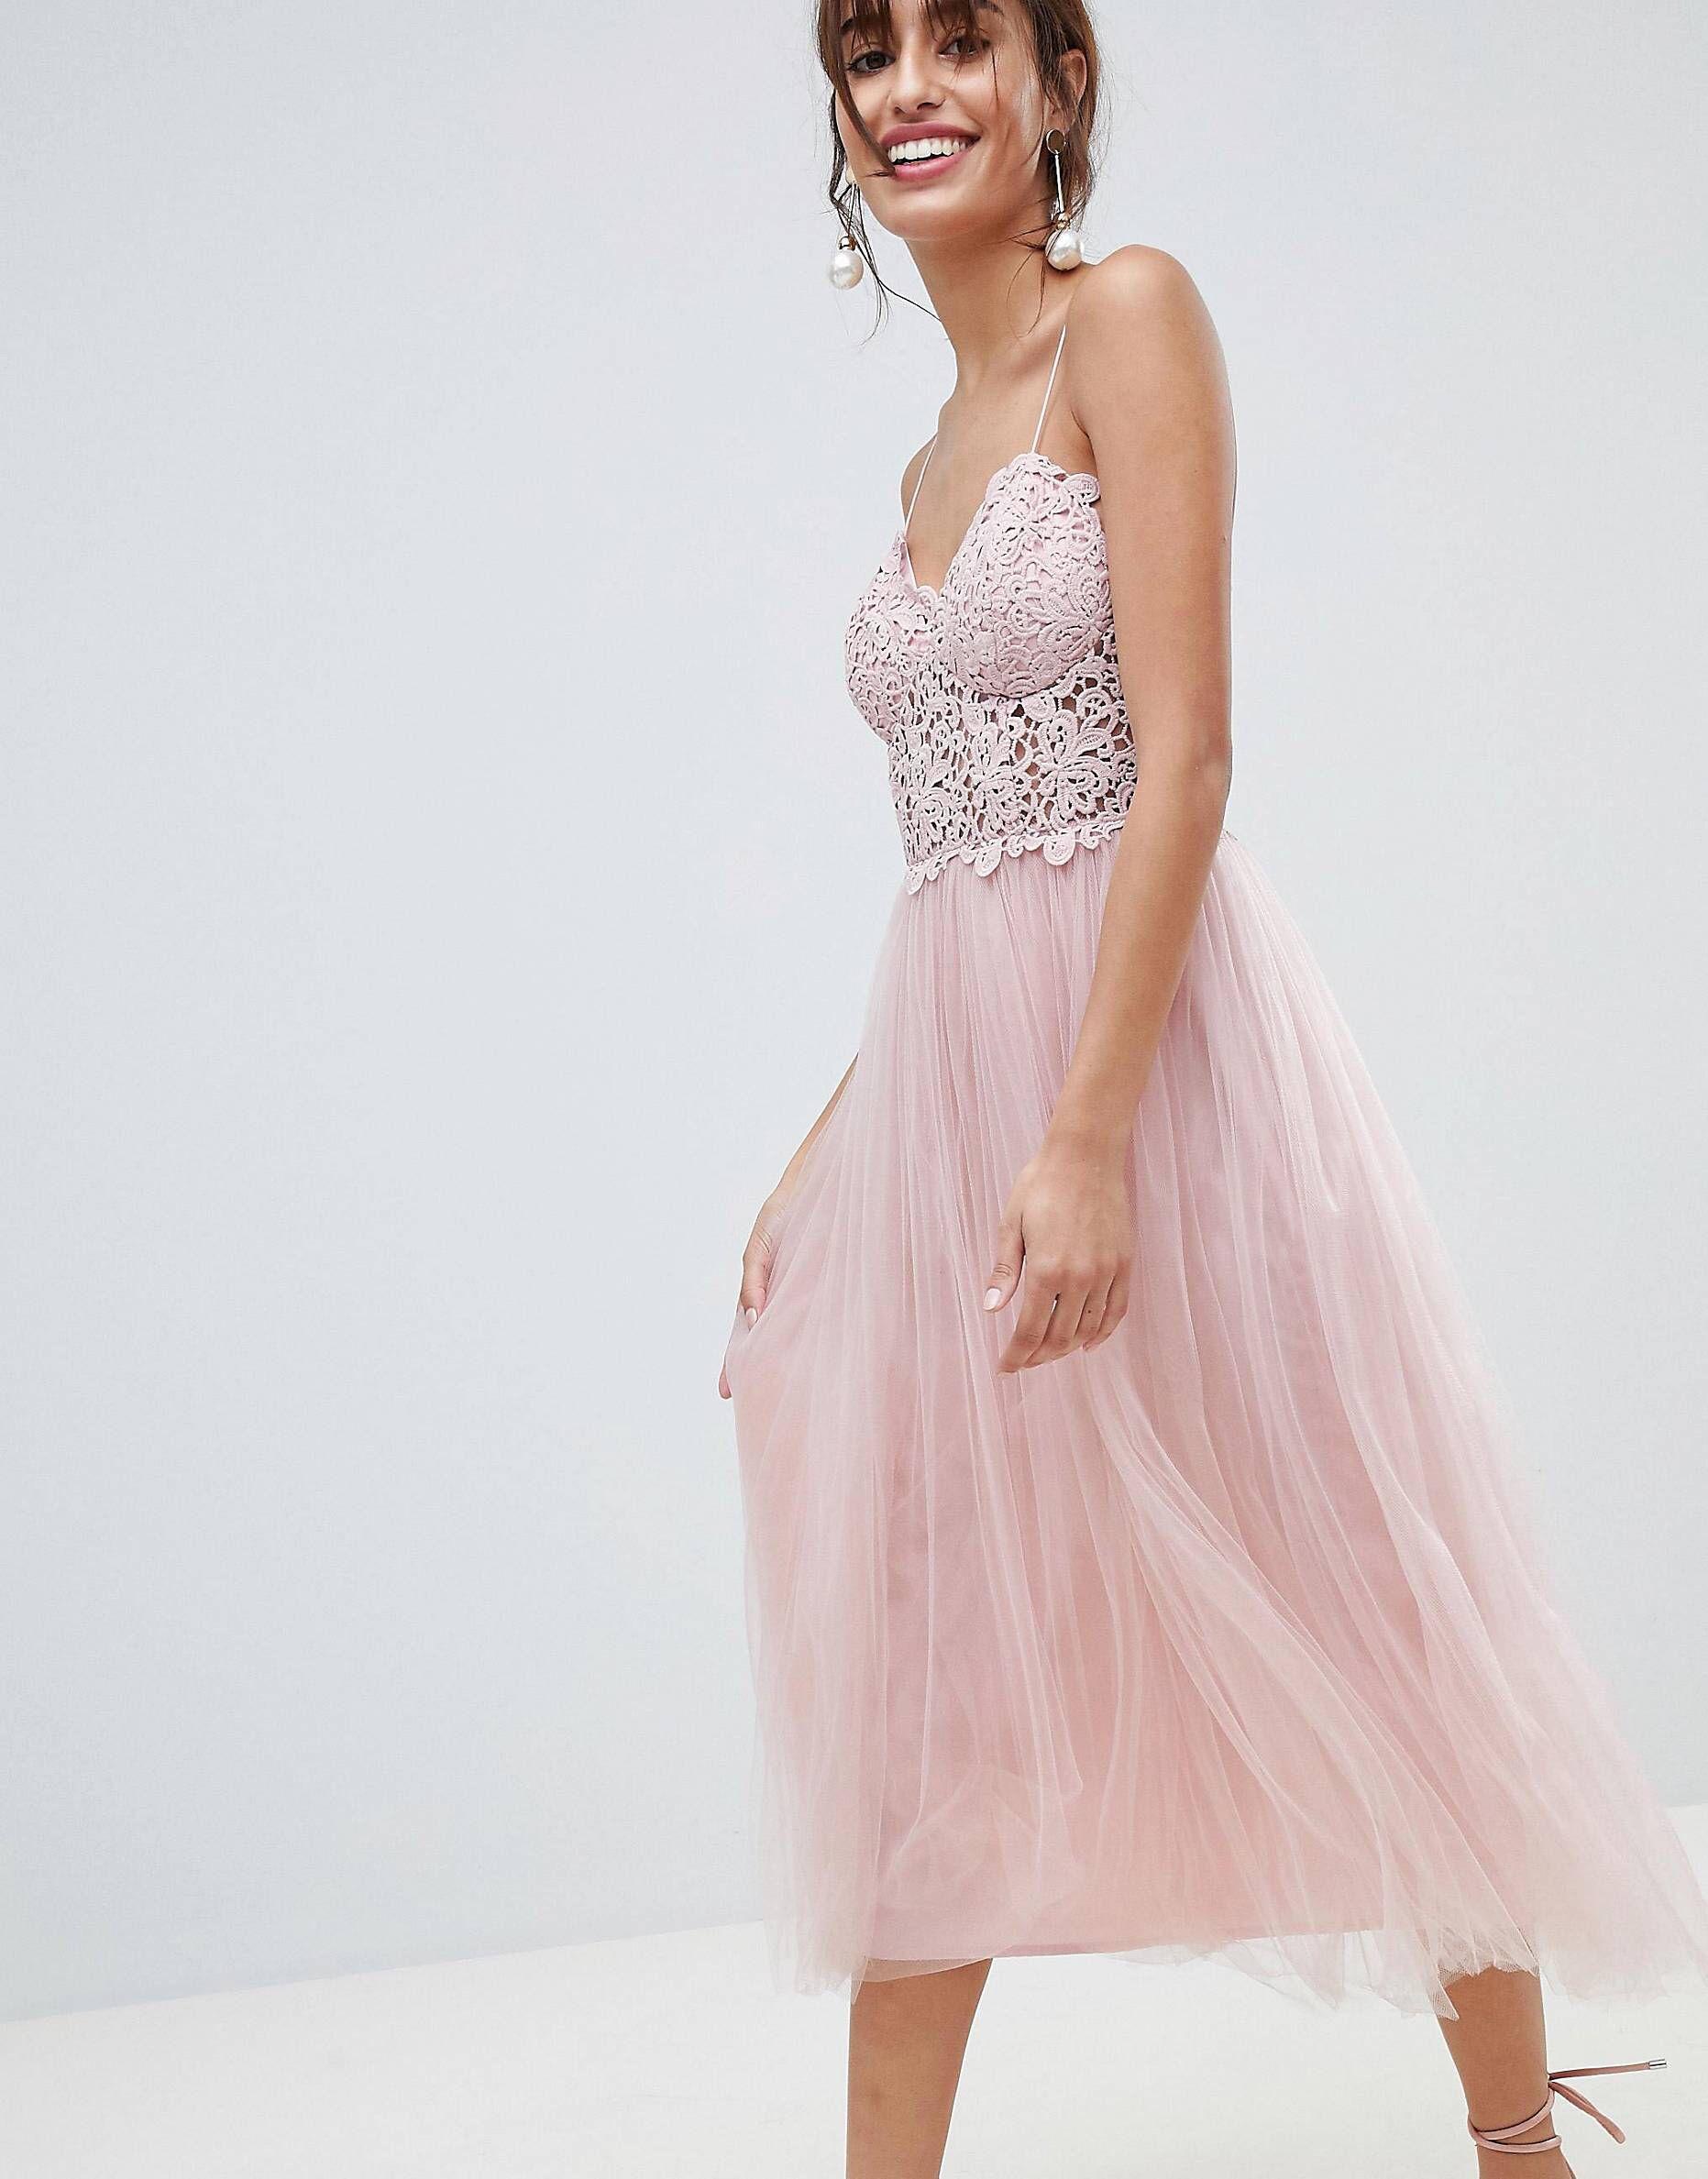 55dc849e031 Asos Premium Lace Cami Top Tulle Midi Dress